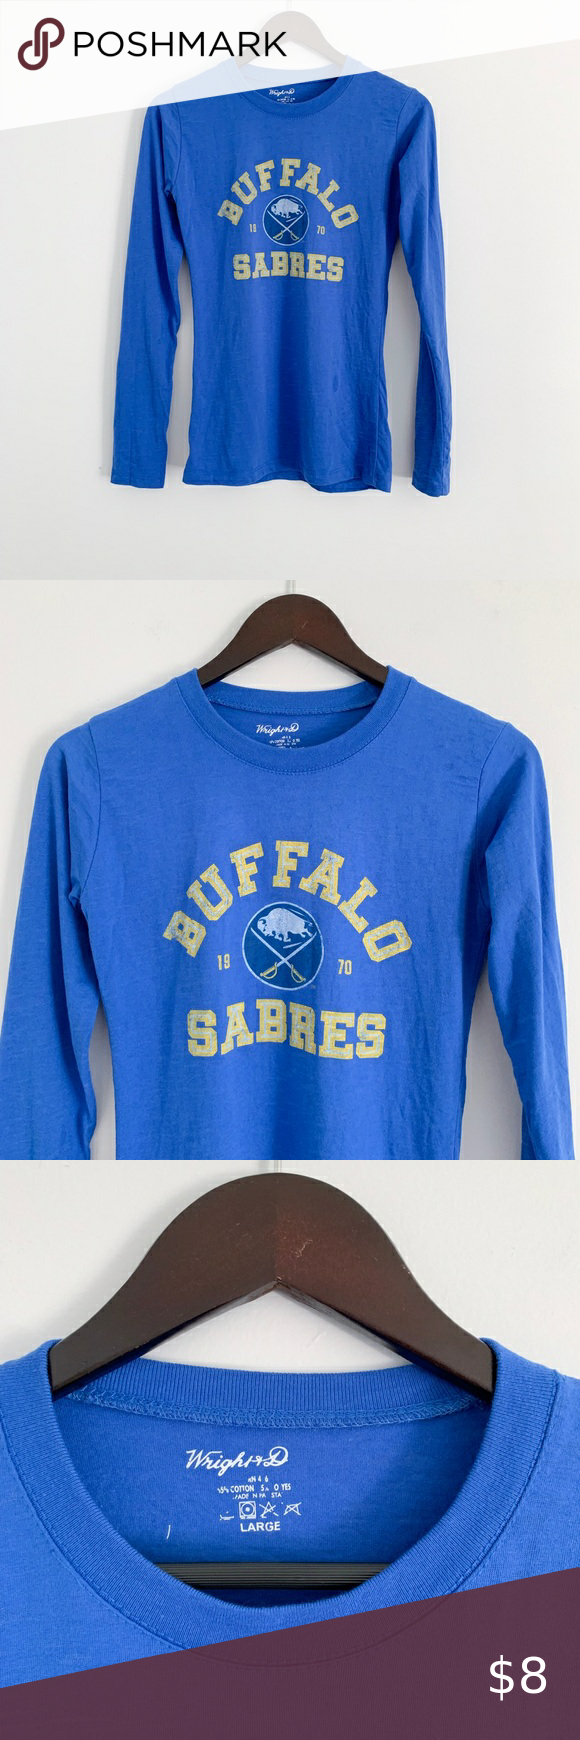 Vintage 90 S Buffalo Sabres Logo 7 Crewneck Sweatshirt Sz L Vintage Sportswear Crew Neck Sweatshirt Sweatshirts [ 1443 x 1203 Pixel ]